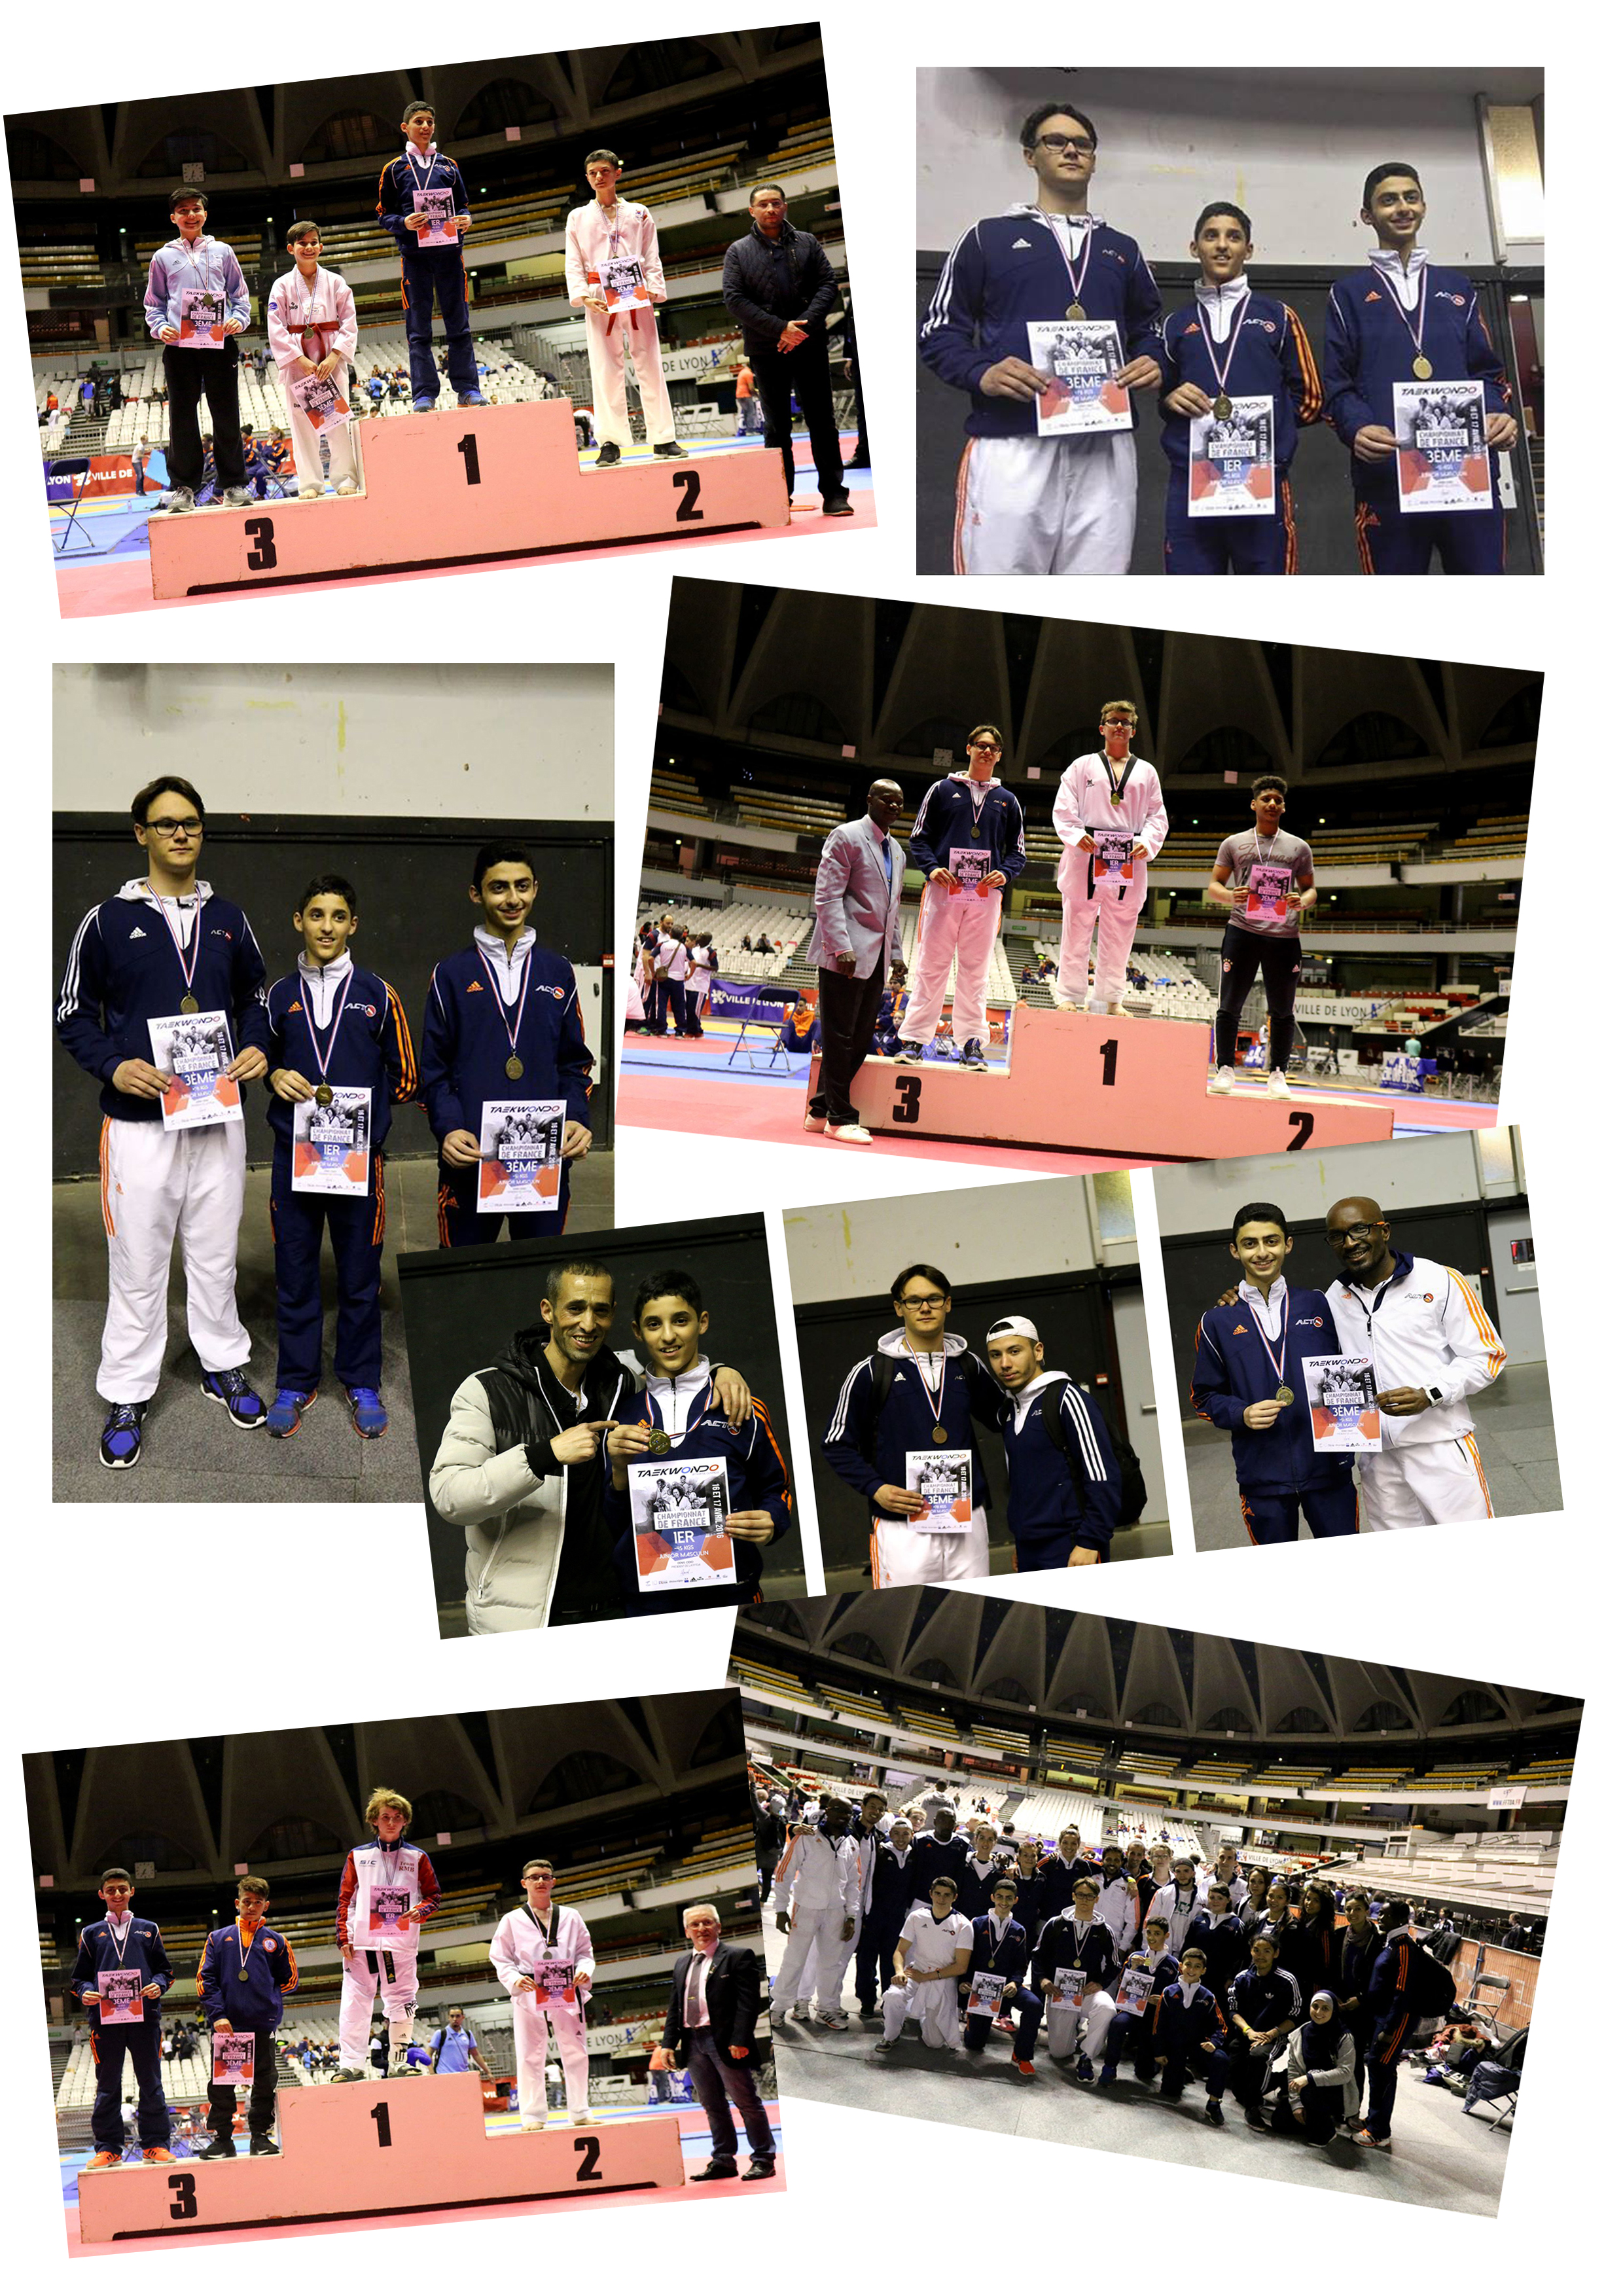 podiums CHAMPIONNATS DE FRANCE TAEKWONDO 2016 ACT PHOENIX